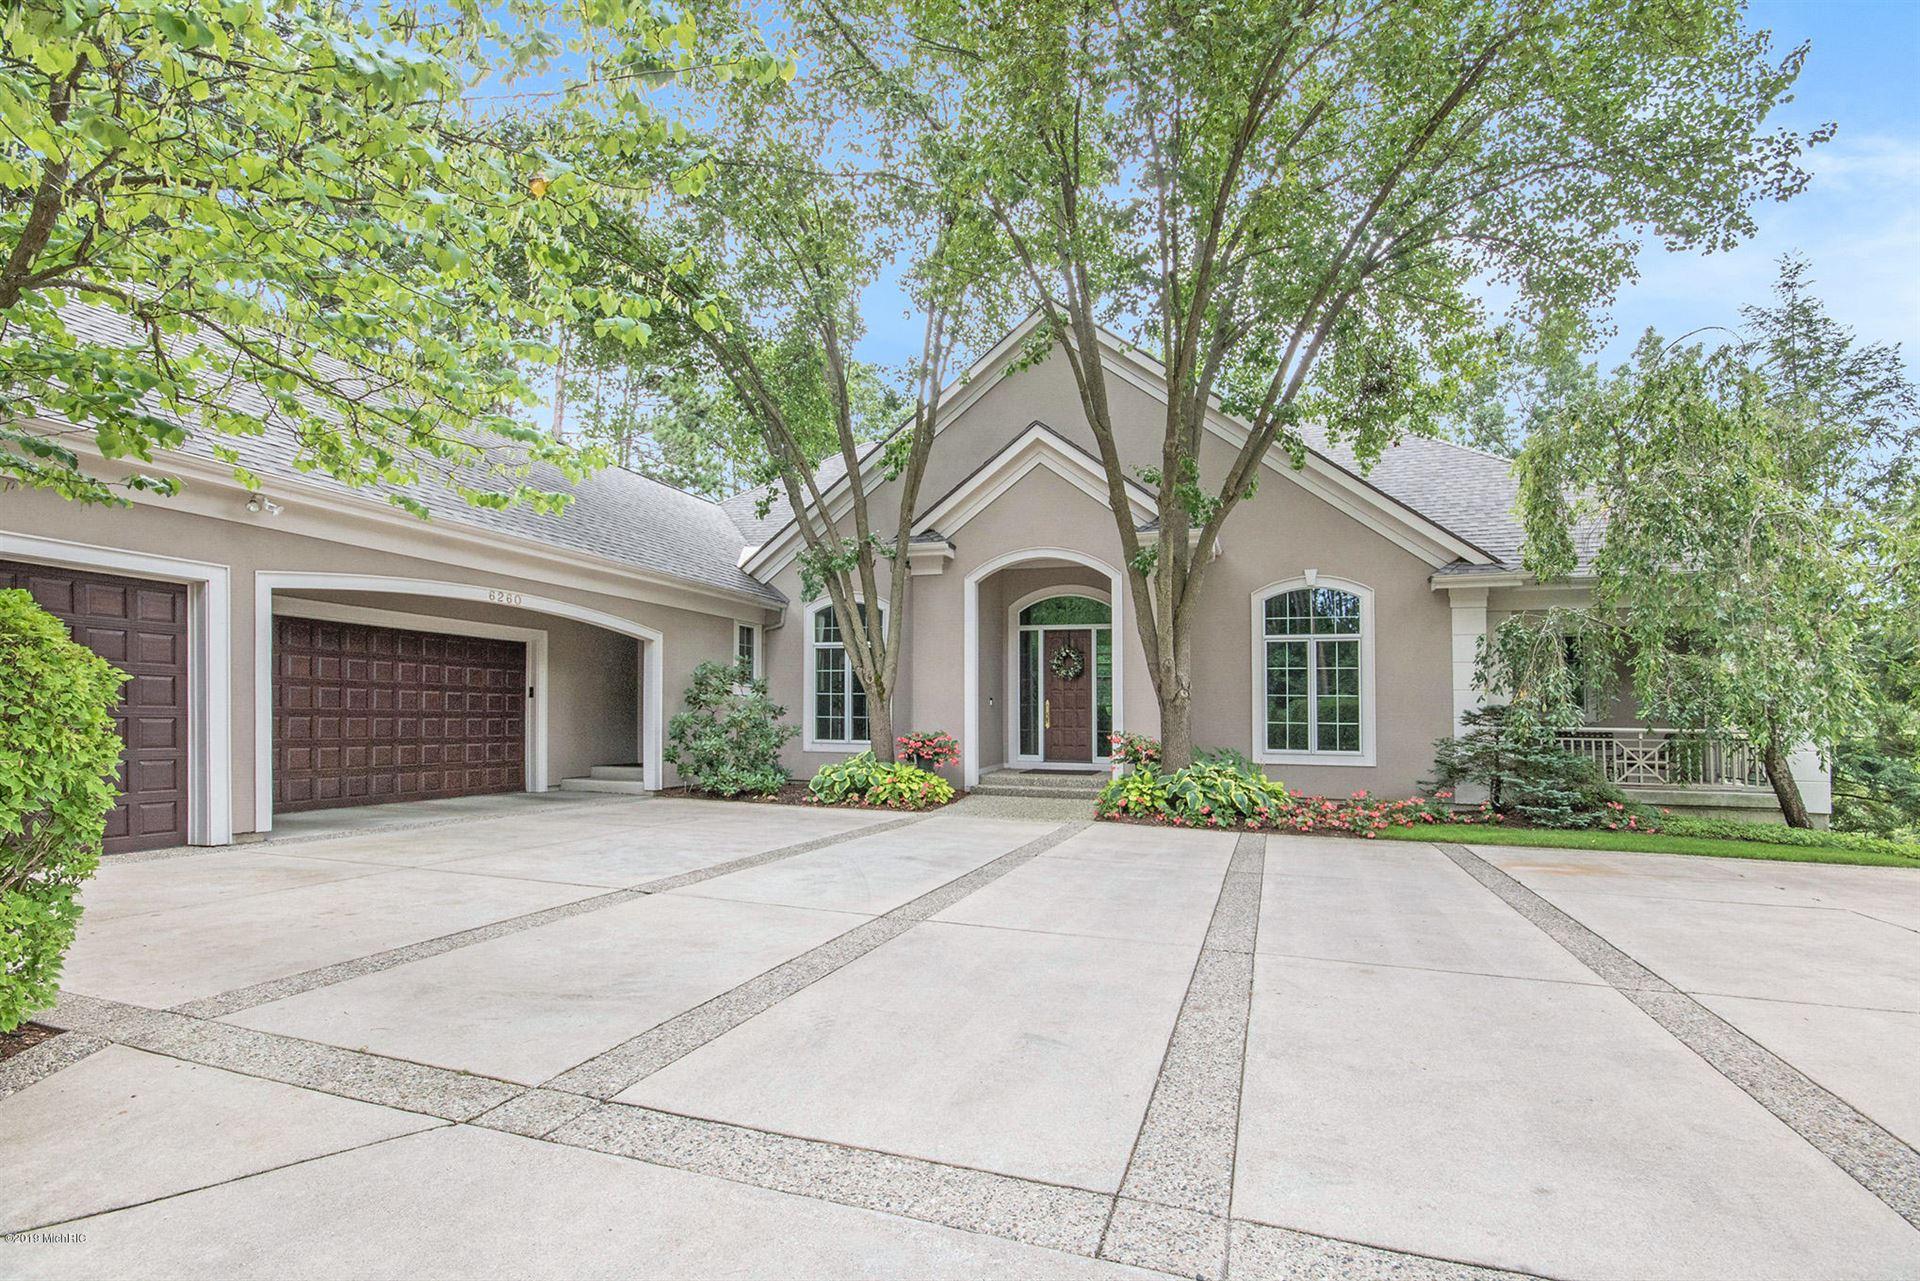 6260 Meadowood Trails Court SE, Grand Rapids, MI 49546 - #: 19039787